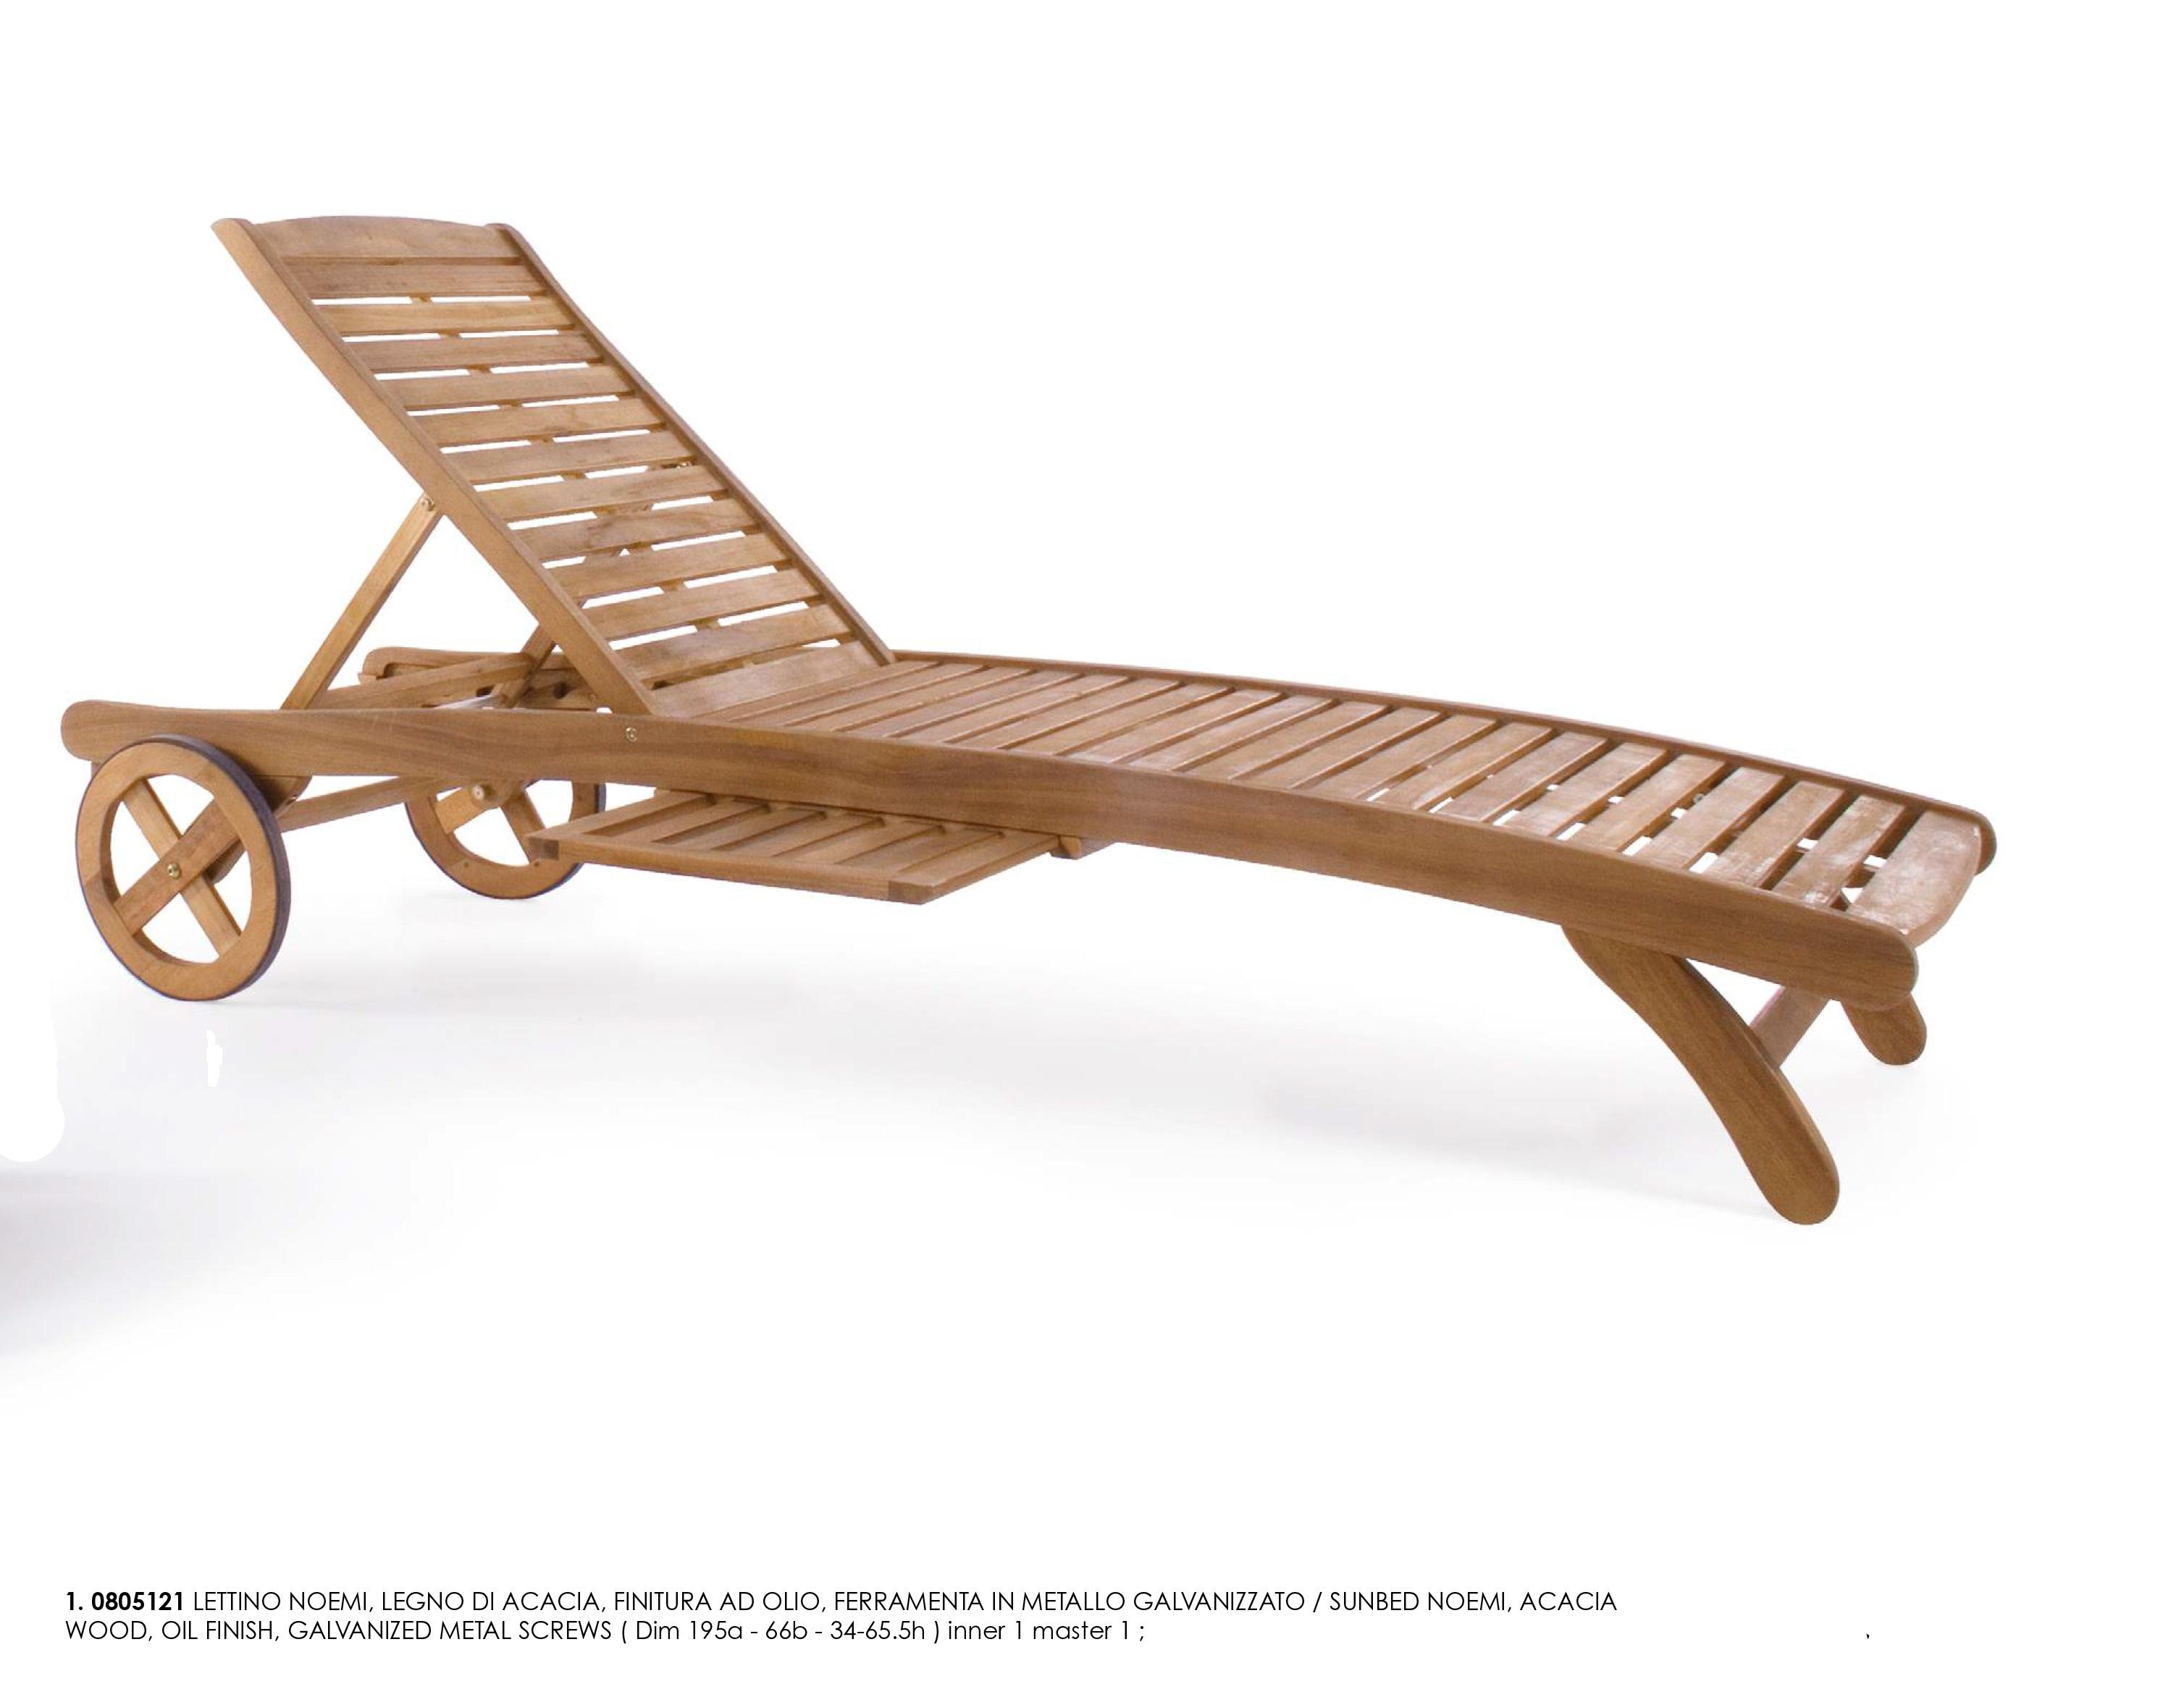 Bizzotto lettino noemi regolabile giardino spiaggia legno - Lettino giardino ...